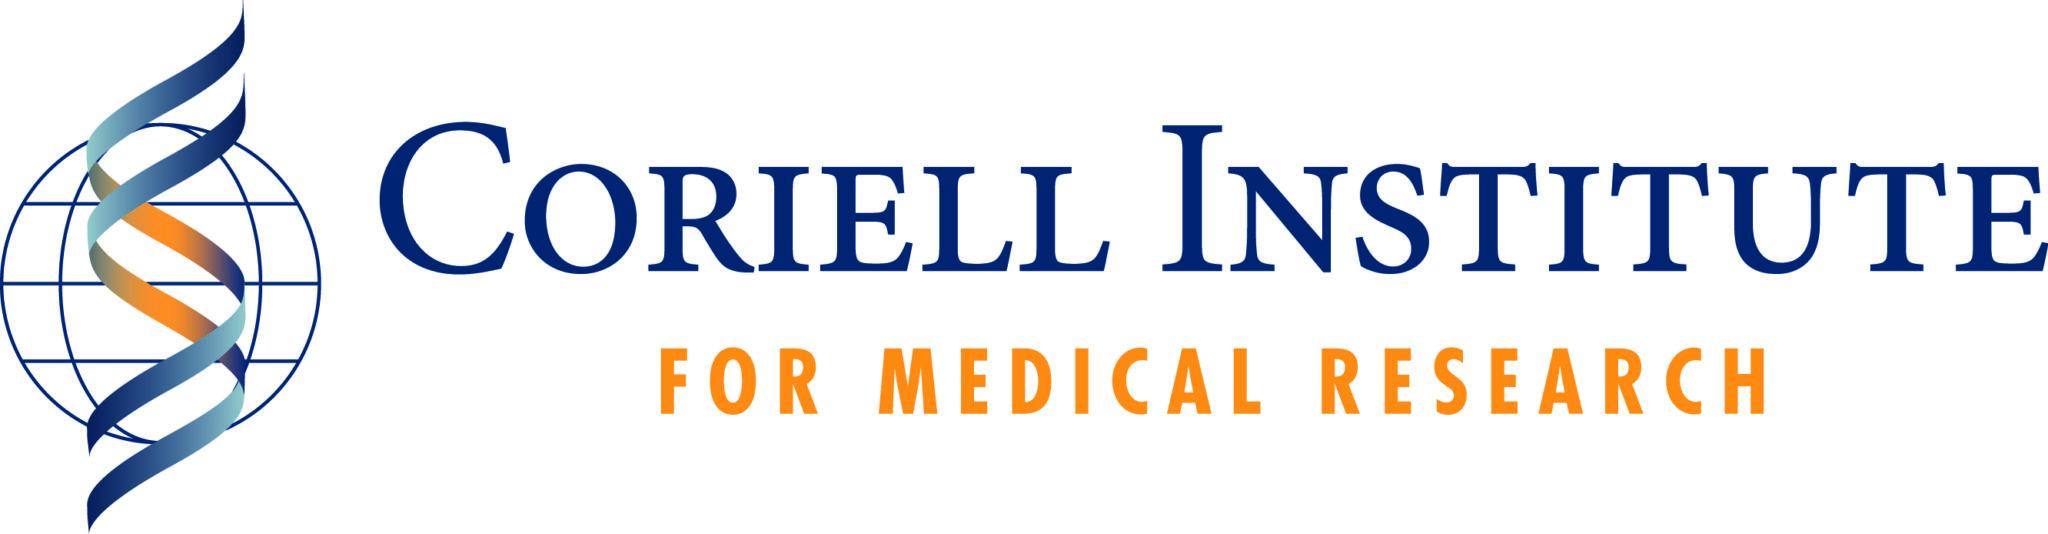 Coriell_Logo_NewV3MDB